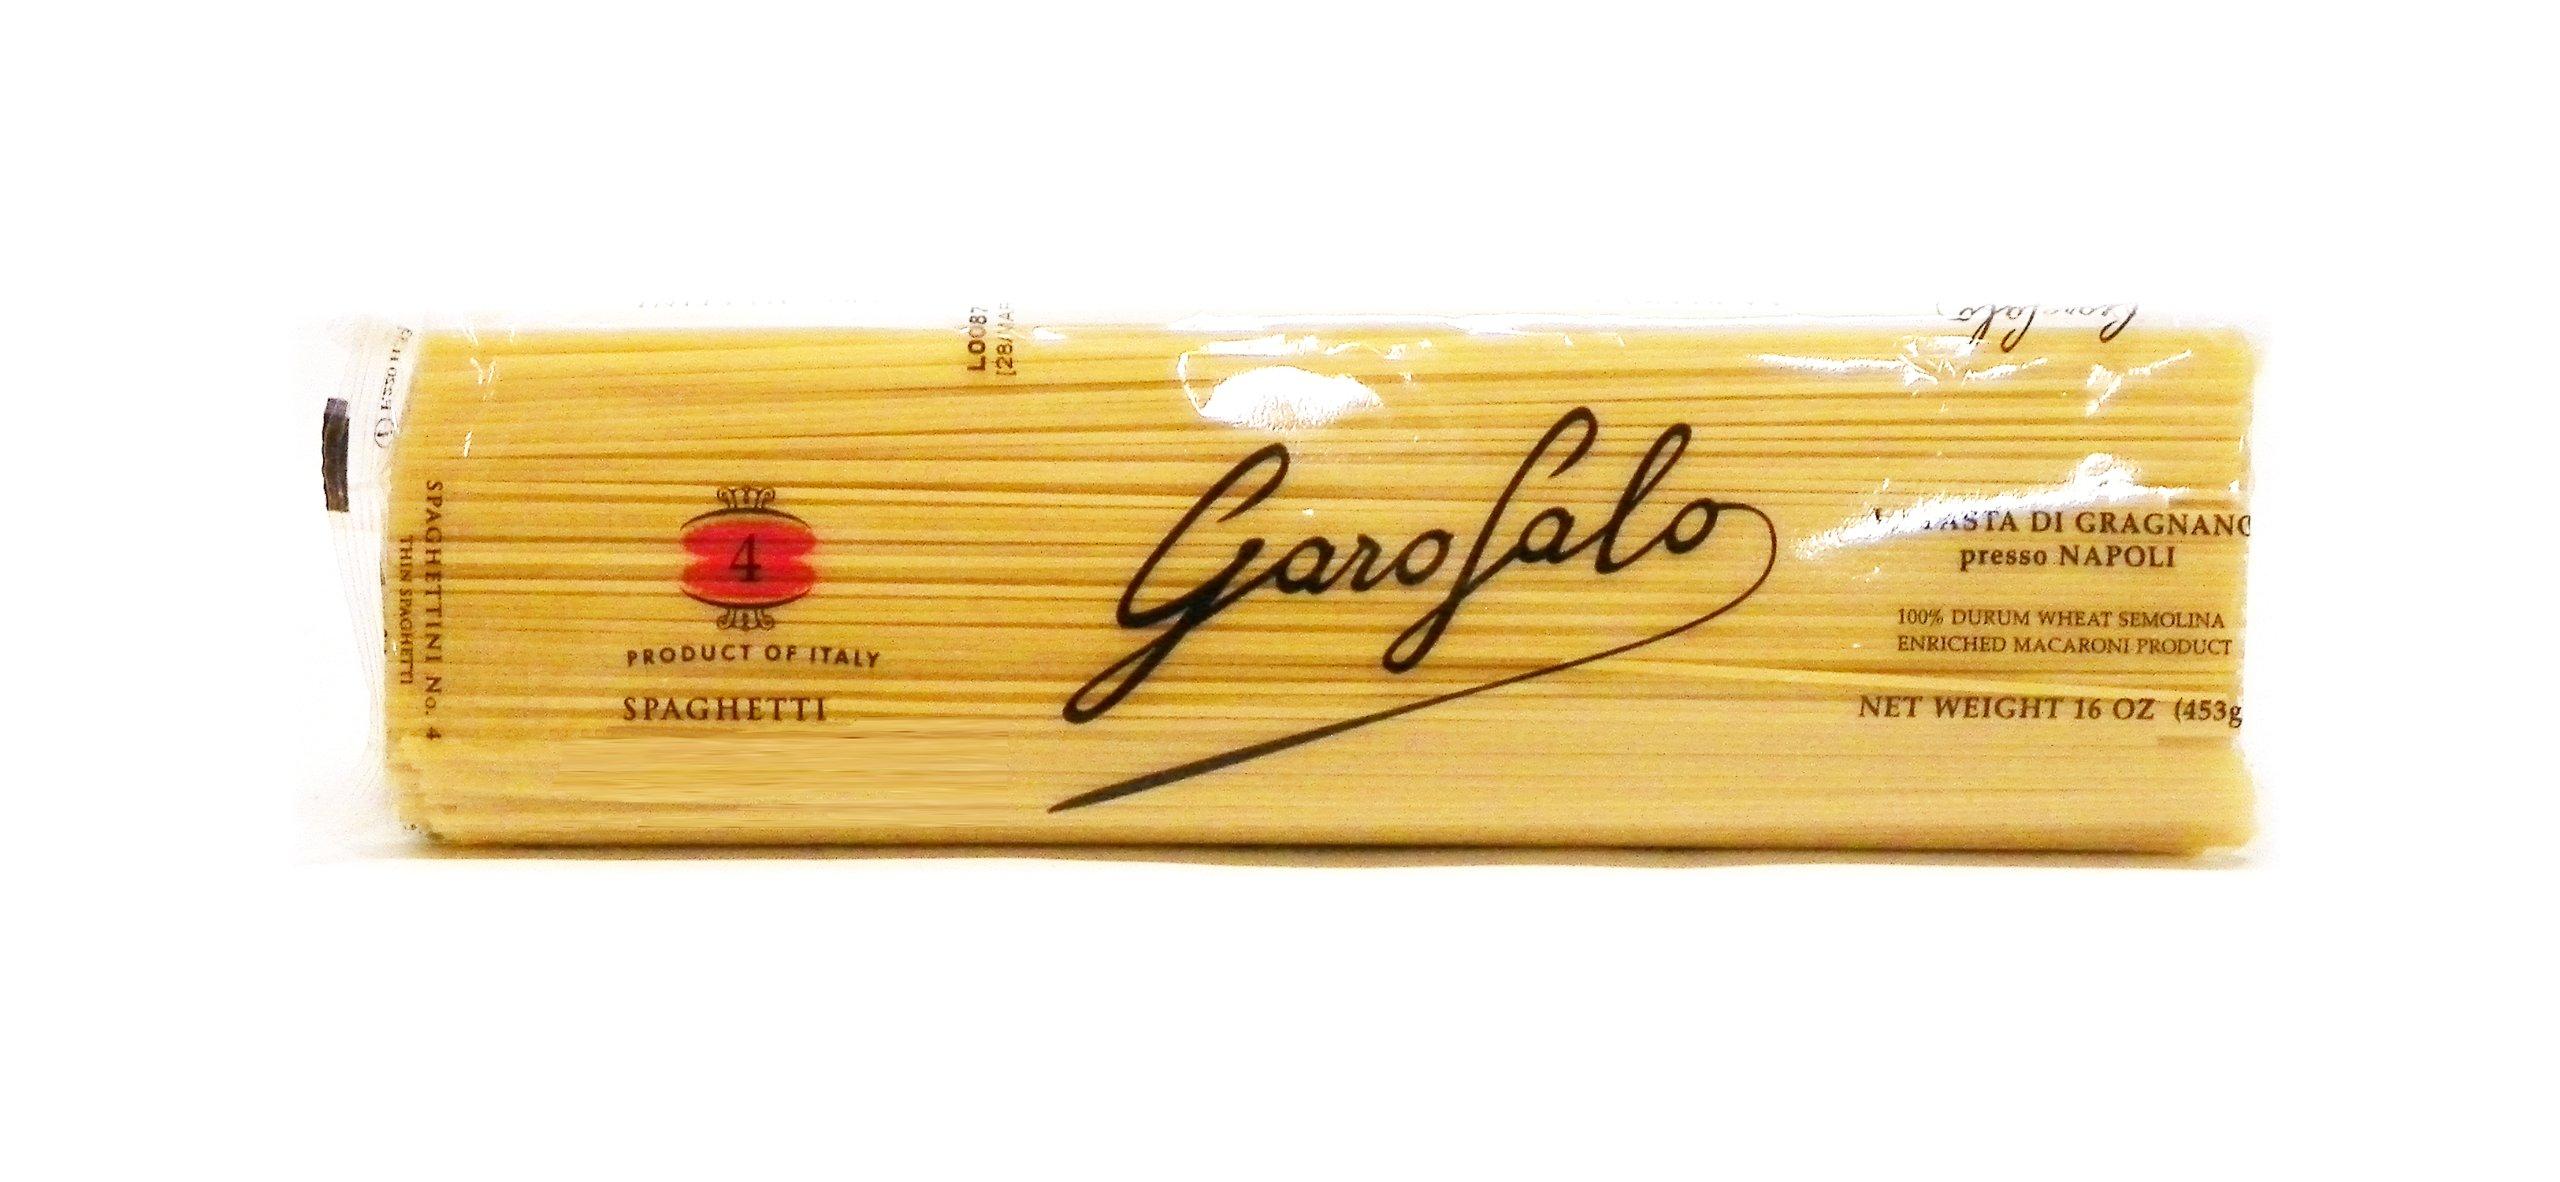 garofalo pasta cooking instructions